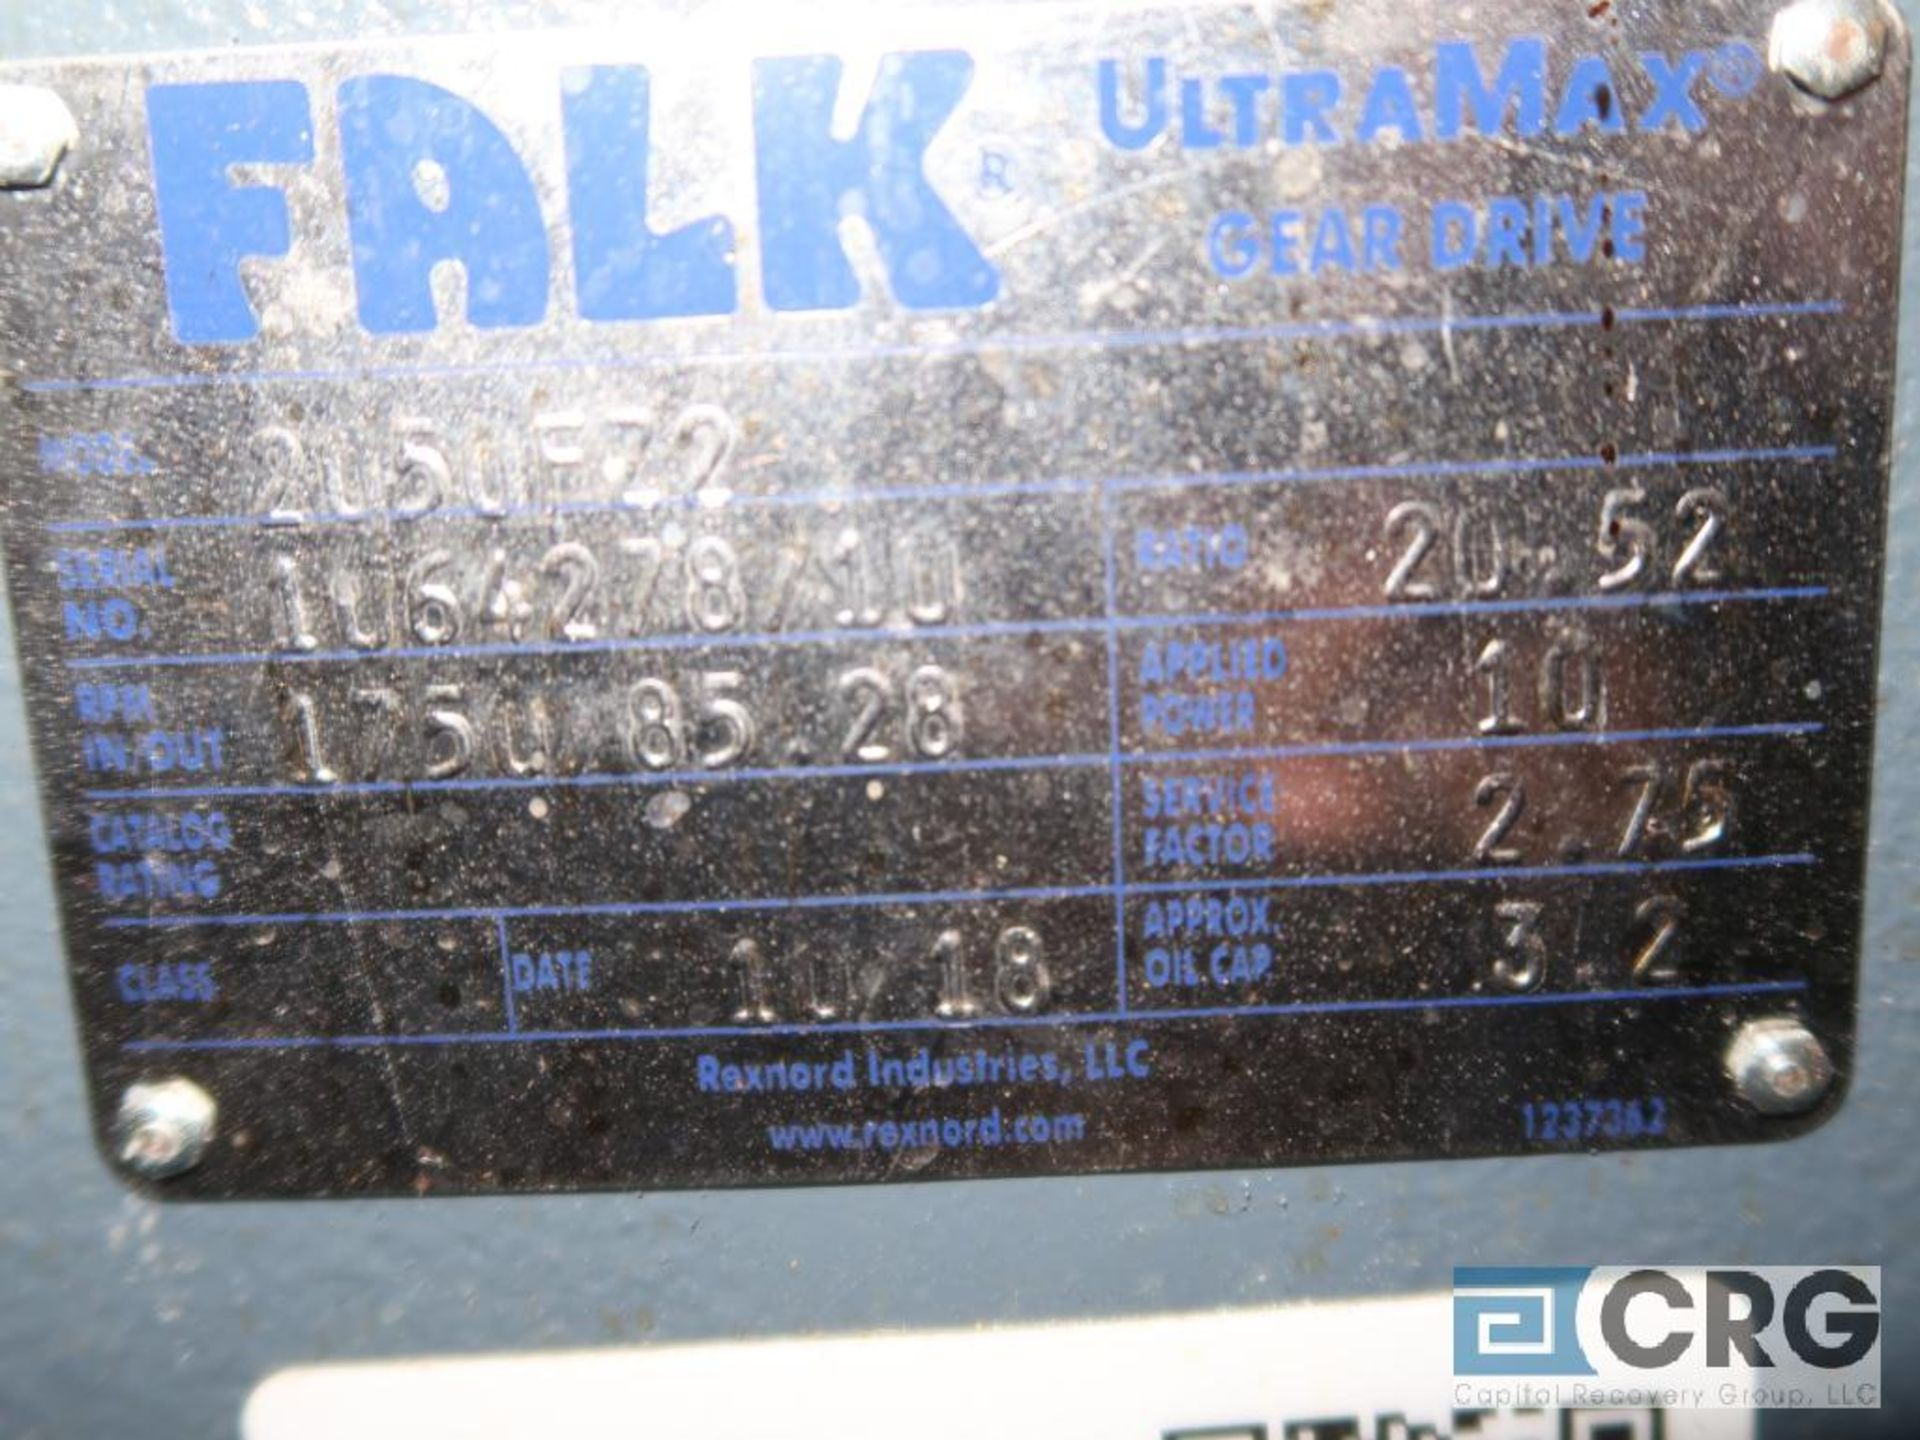 Falk 2050 FZ2 gear drive, ratio 20.52, input RPM 1,750/85.20, service rate HP. 10, s/n 4278710 (Next - Image 2 of 2